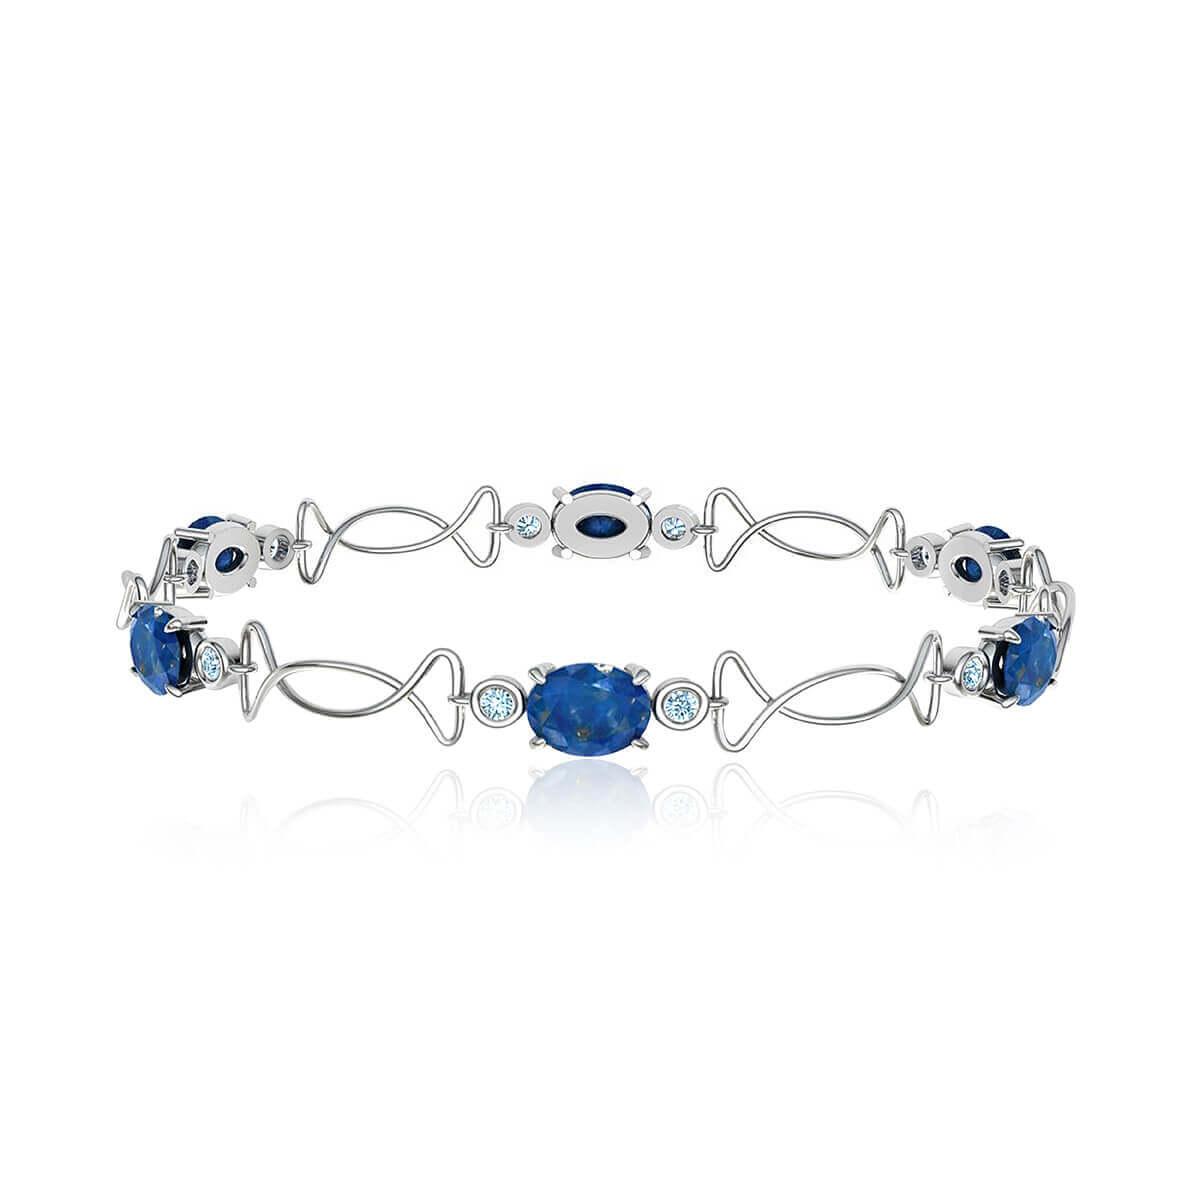 Bashford AnaCapri Sapphire and Diamond Bracelet (1/2 CT. TW.)